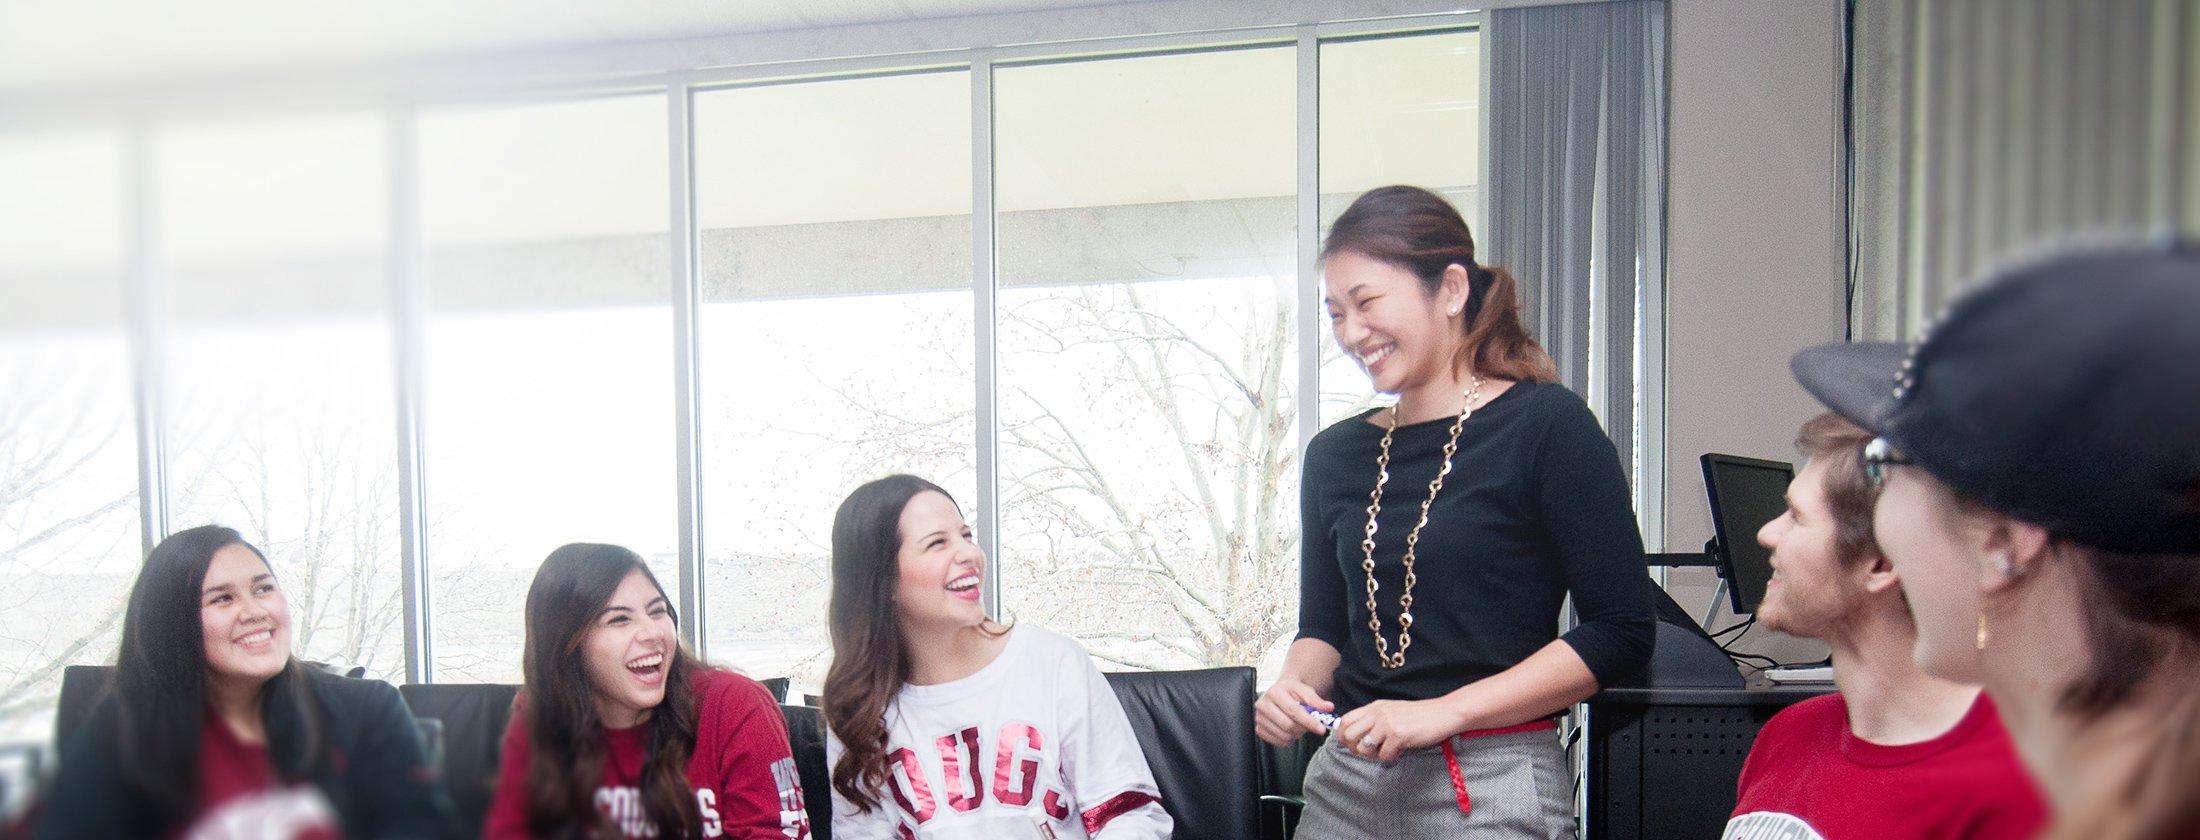 How do you go about requesting a new academic advisor (graduate level)?